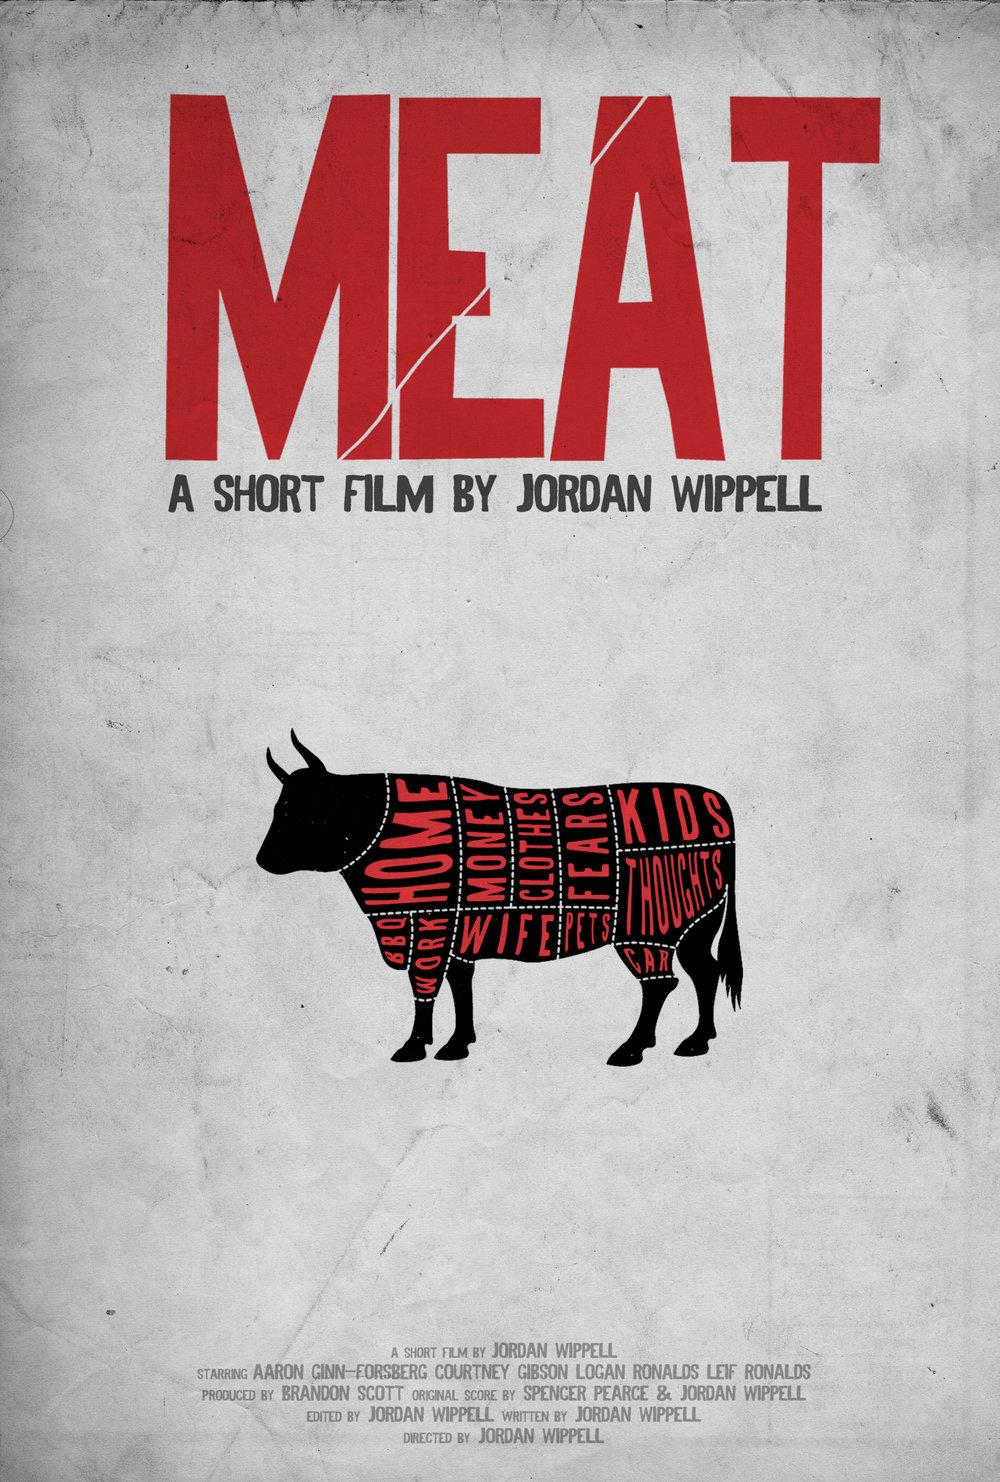 MEAT - Poster2.jpg